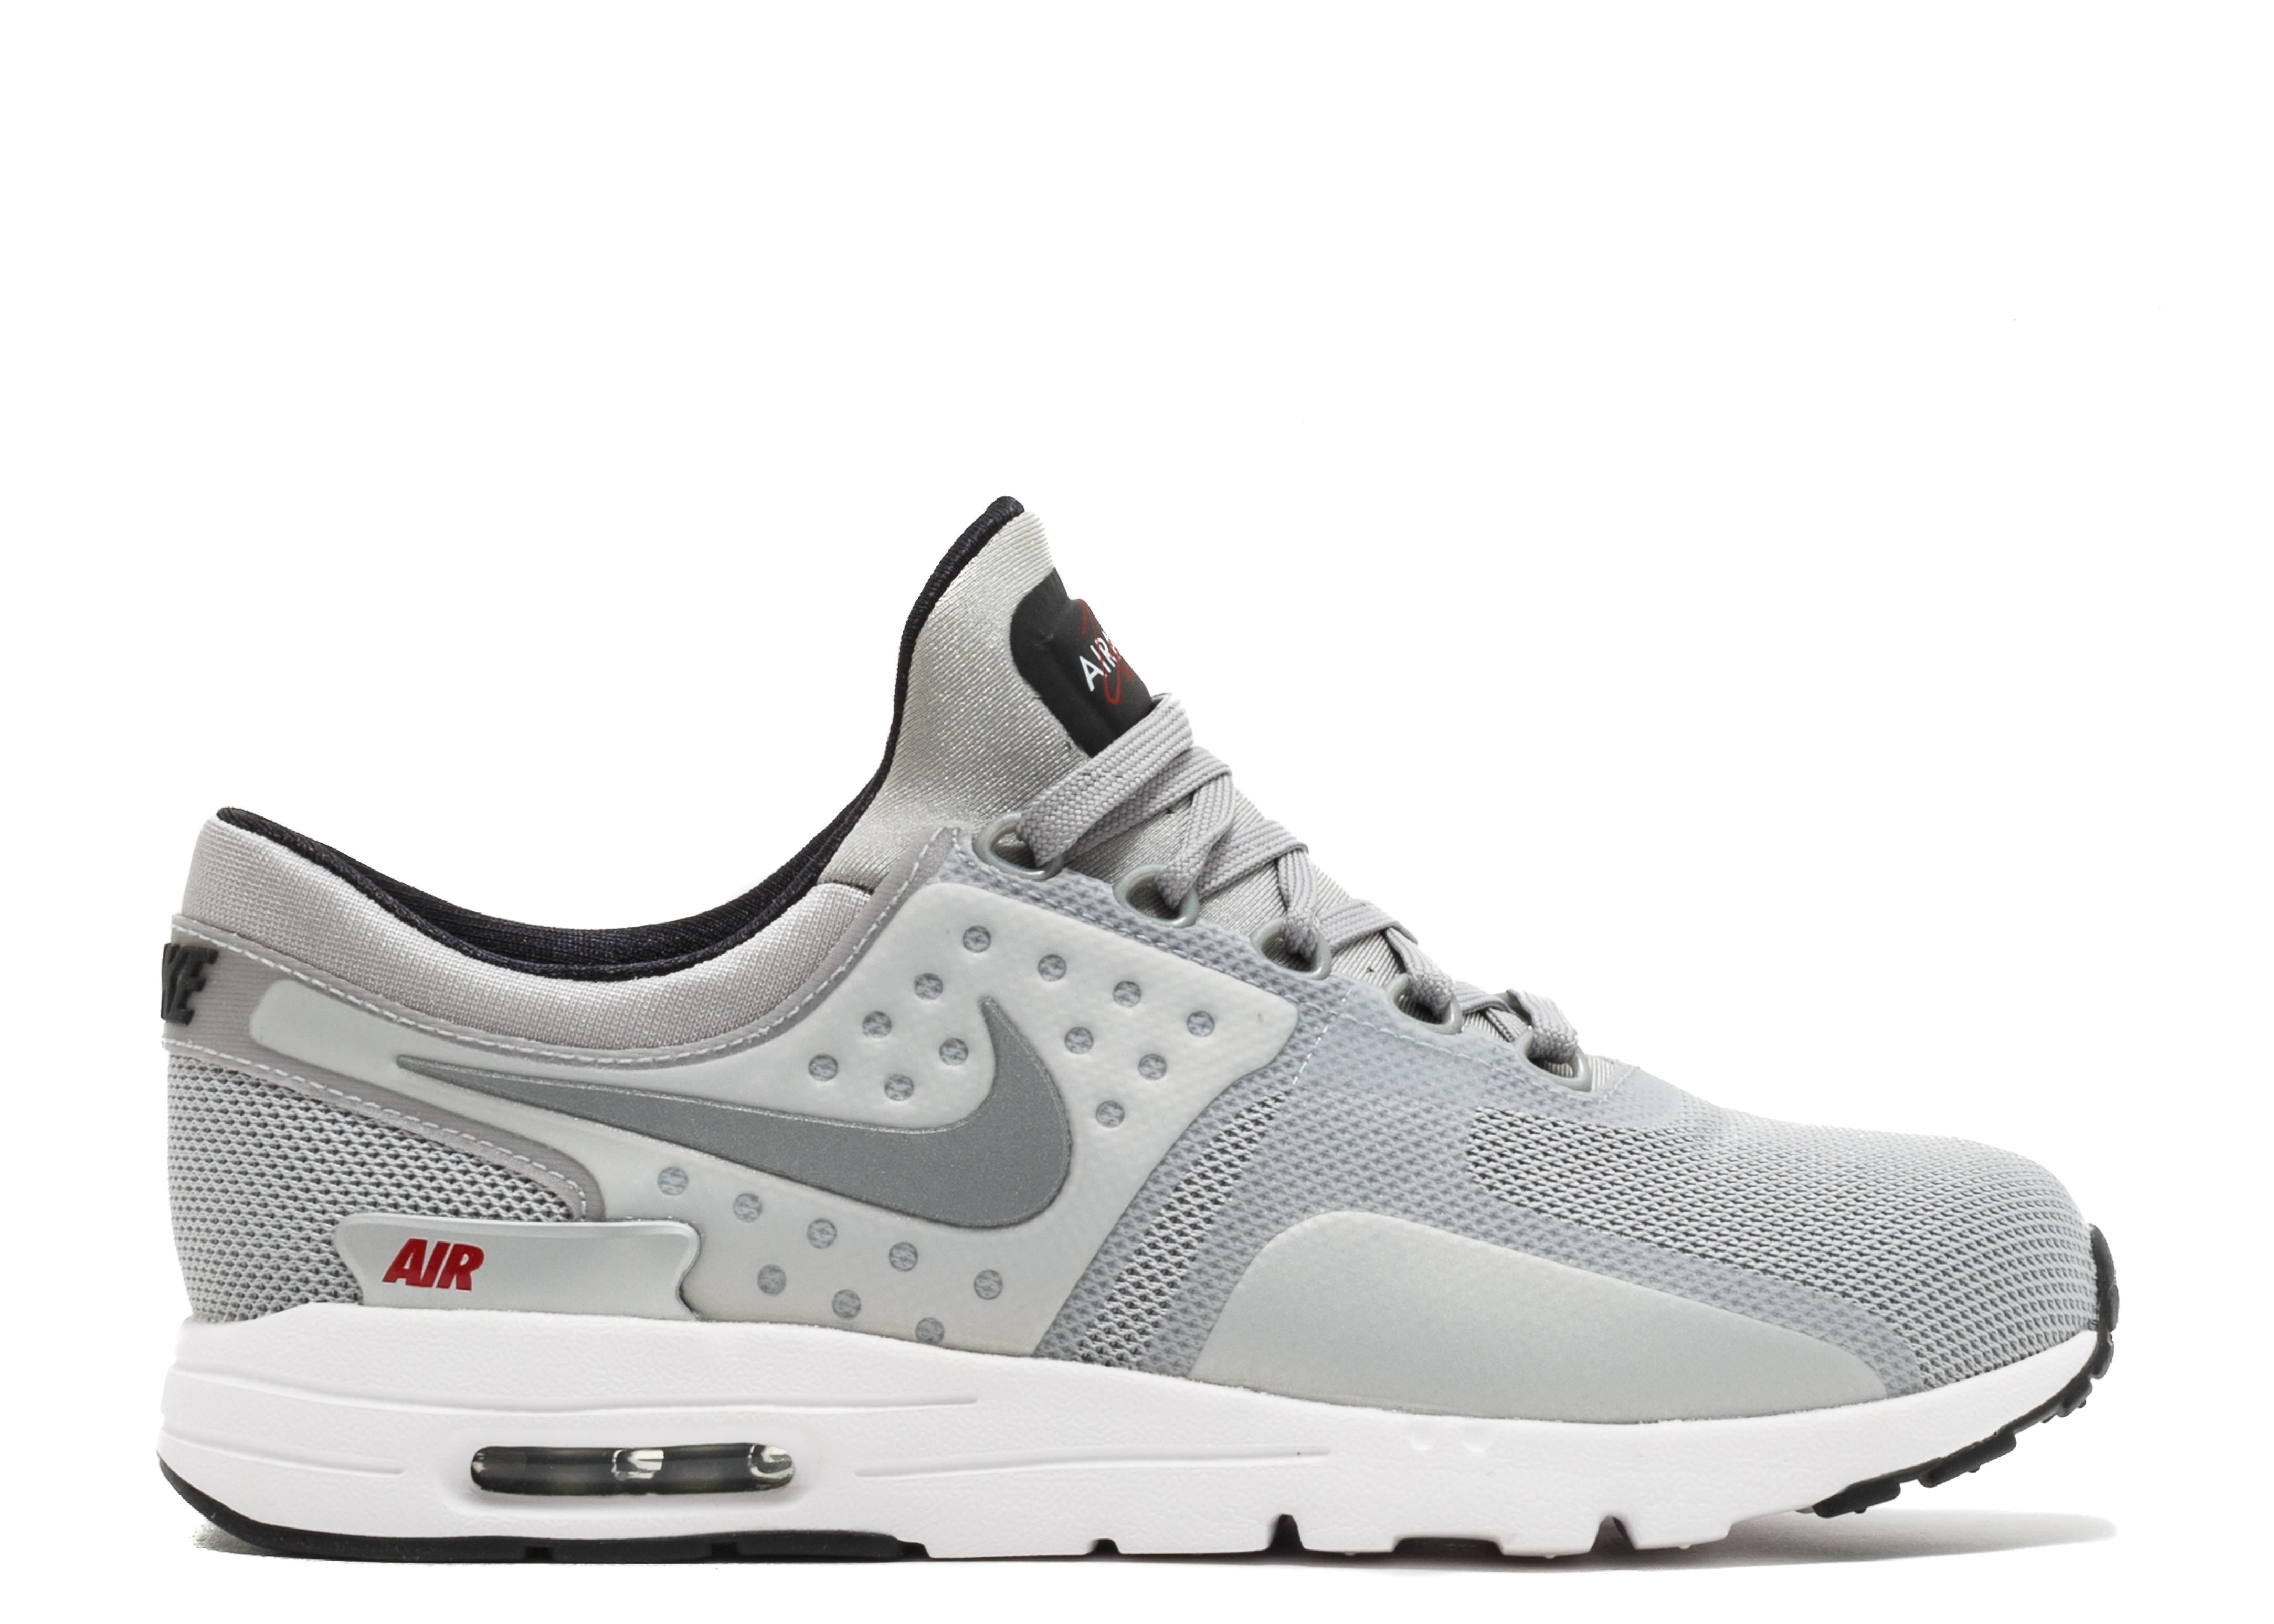 cepillo Lima Empleador  Wmns Air Max Zero QS 'Silver Bullet' - Nike - 863700 002 - metallic  silver/metallic silver-university red   Flight Club